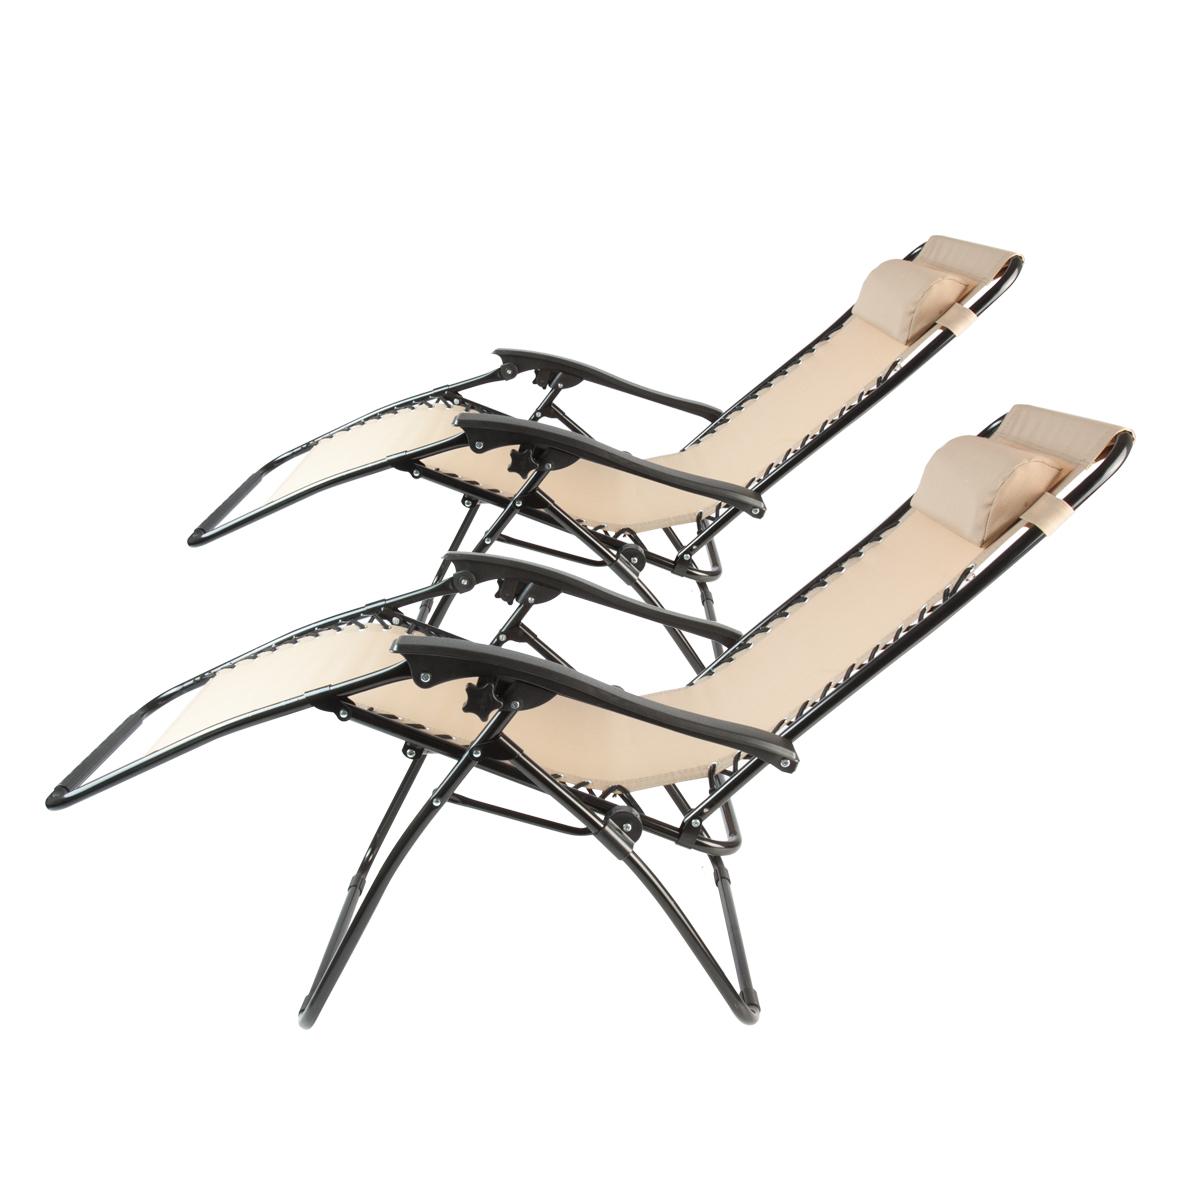 2 Beige Zero Gravity Folding Lounge Chairs Recliner Outdoor Beach Patio Pool New